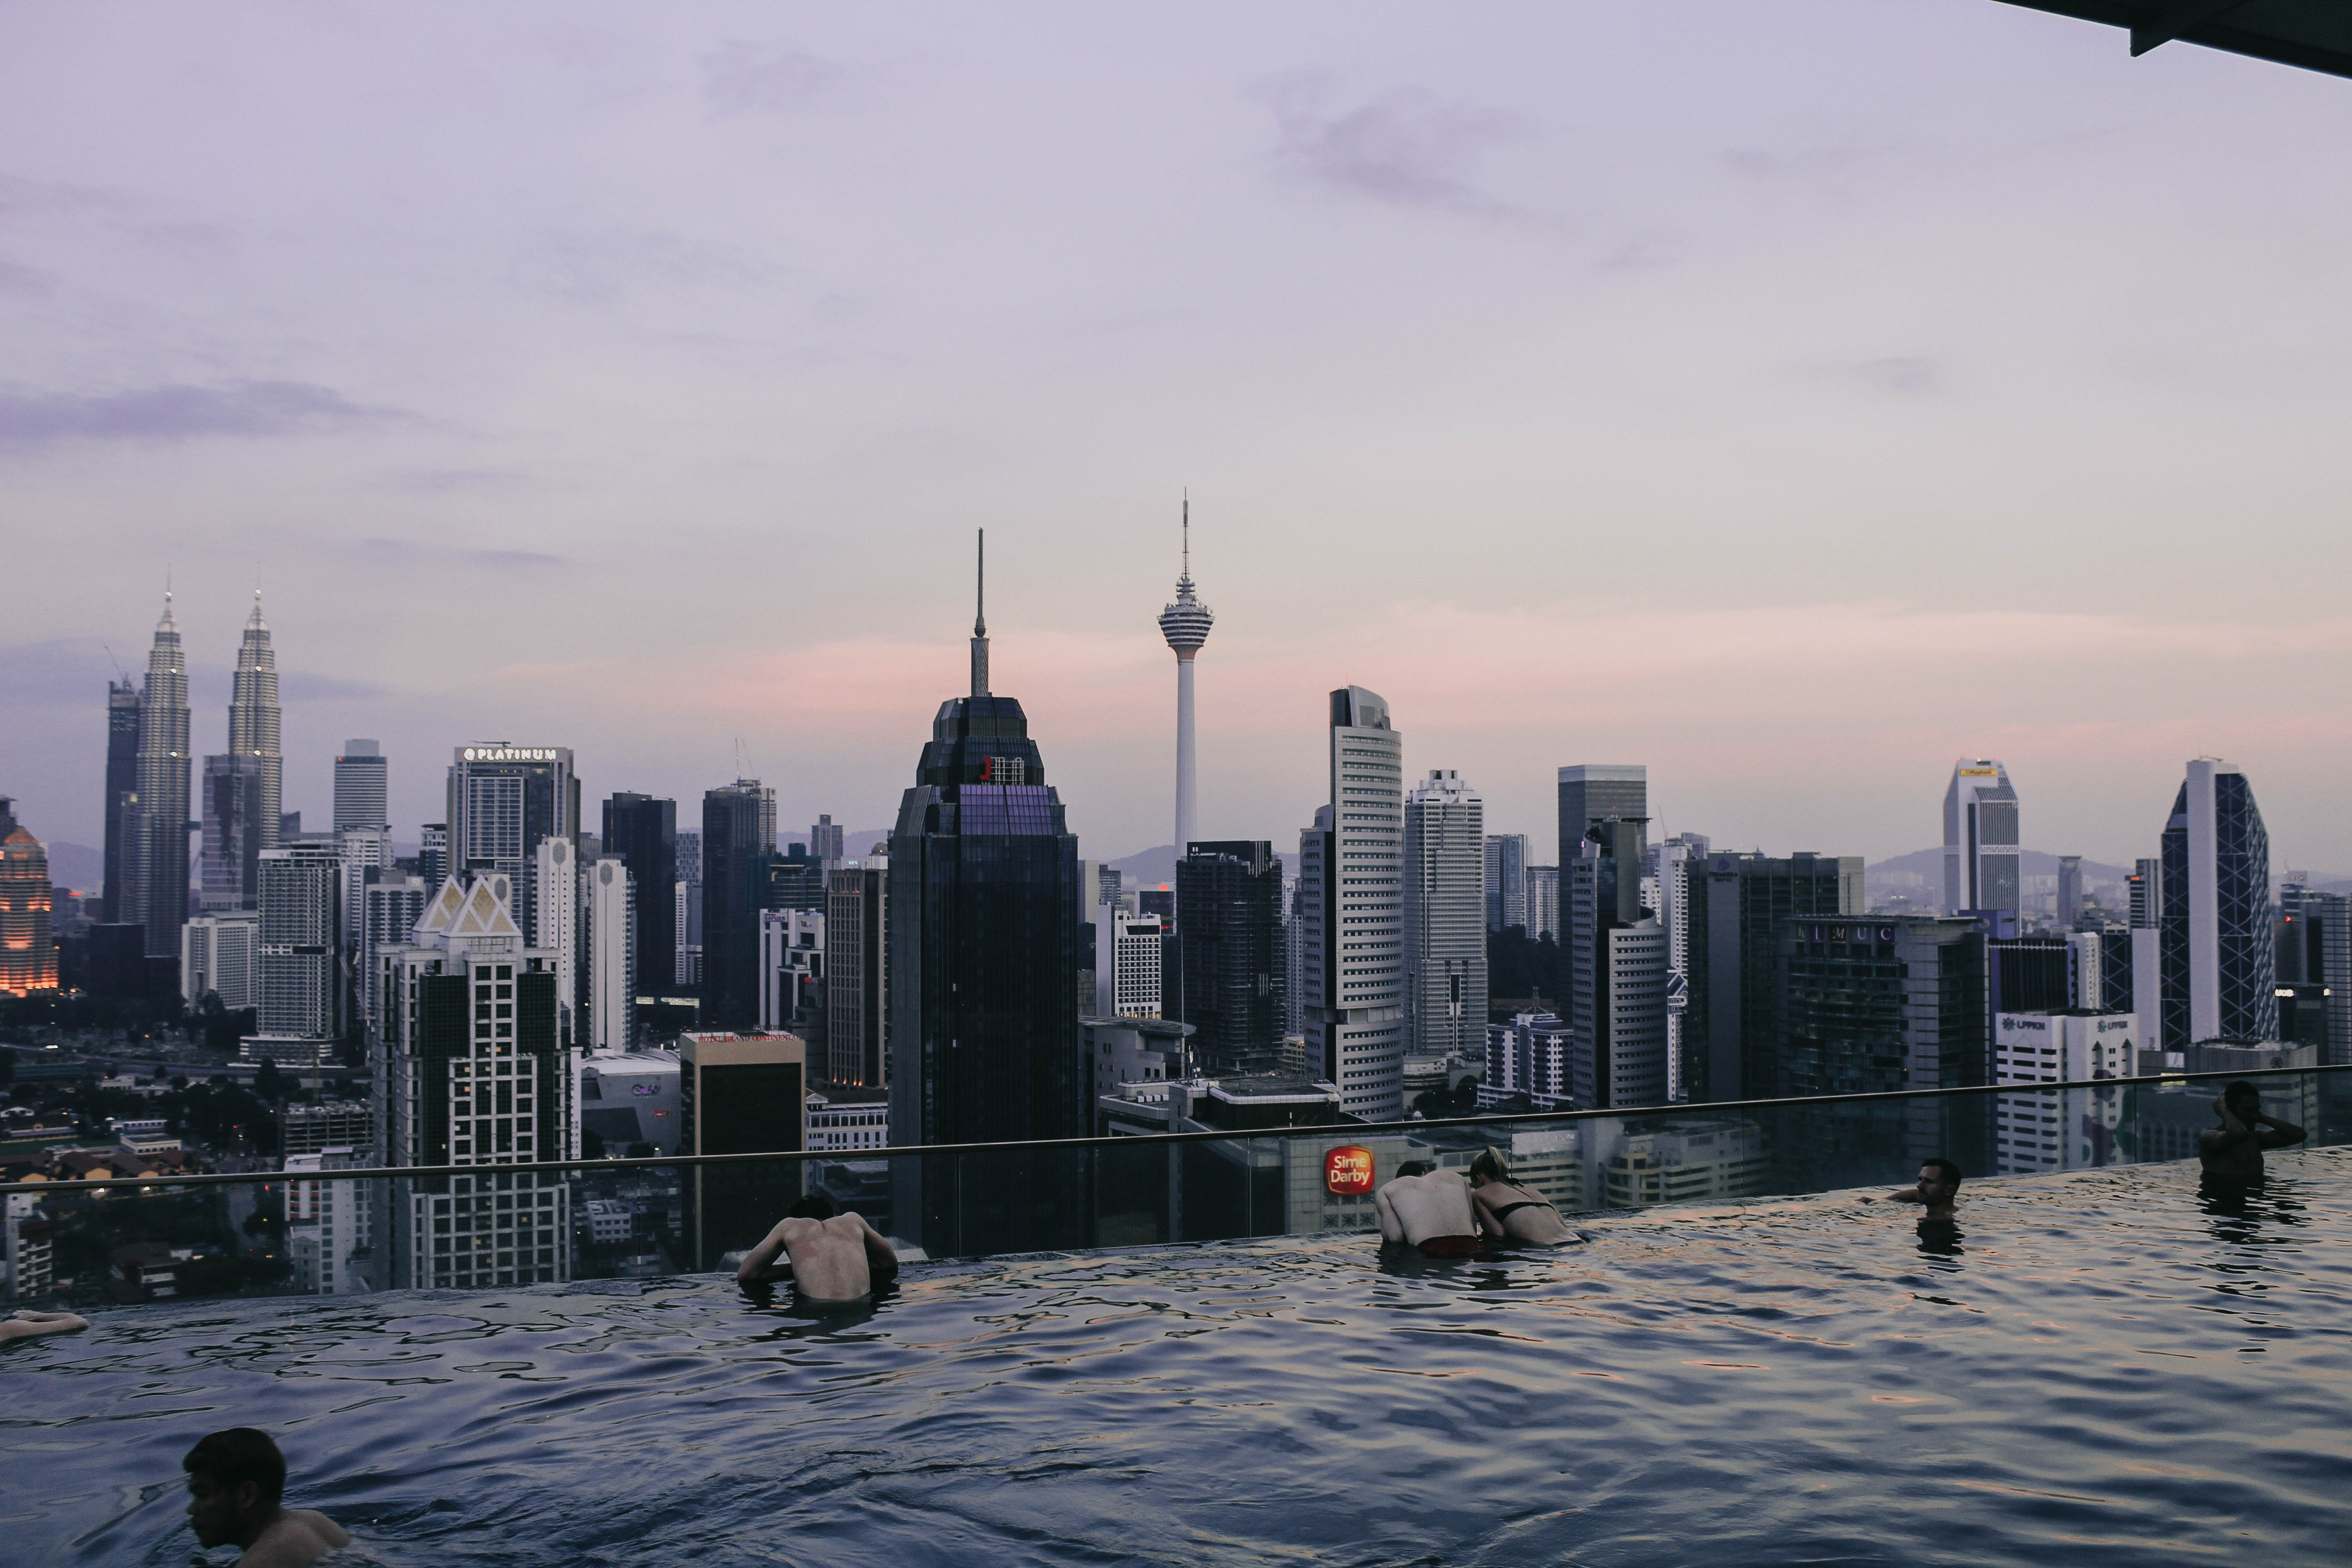 Kuala Lumpur hồ bơi vô cực Regalia Flyover Infinity Pool Sunset